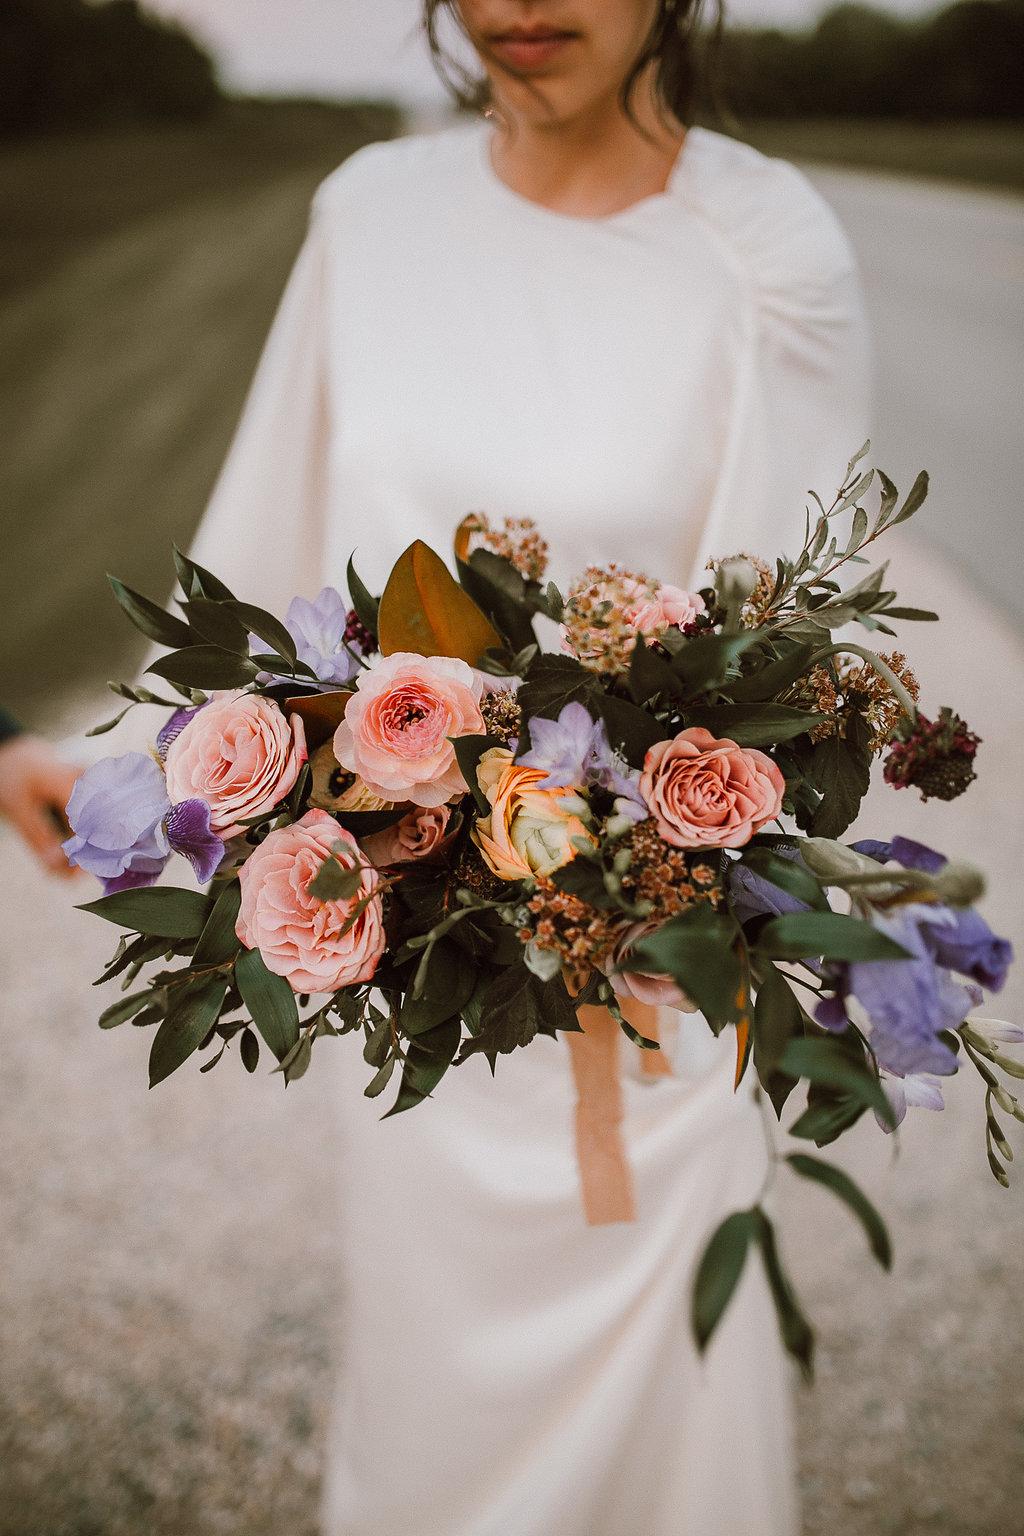 Peach and Mauve Wedding Bouquet - Stone House Creative